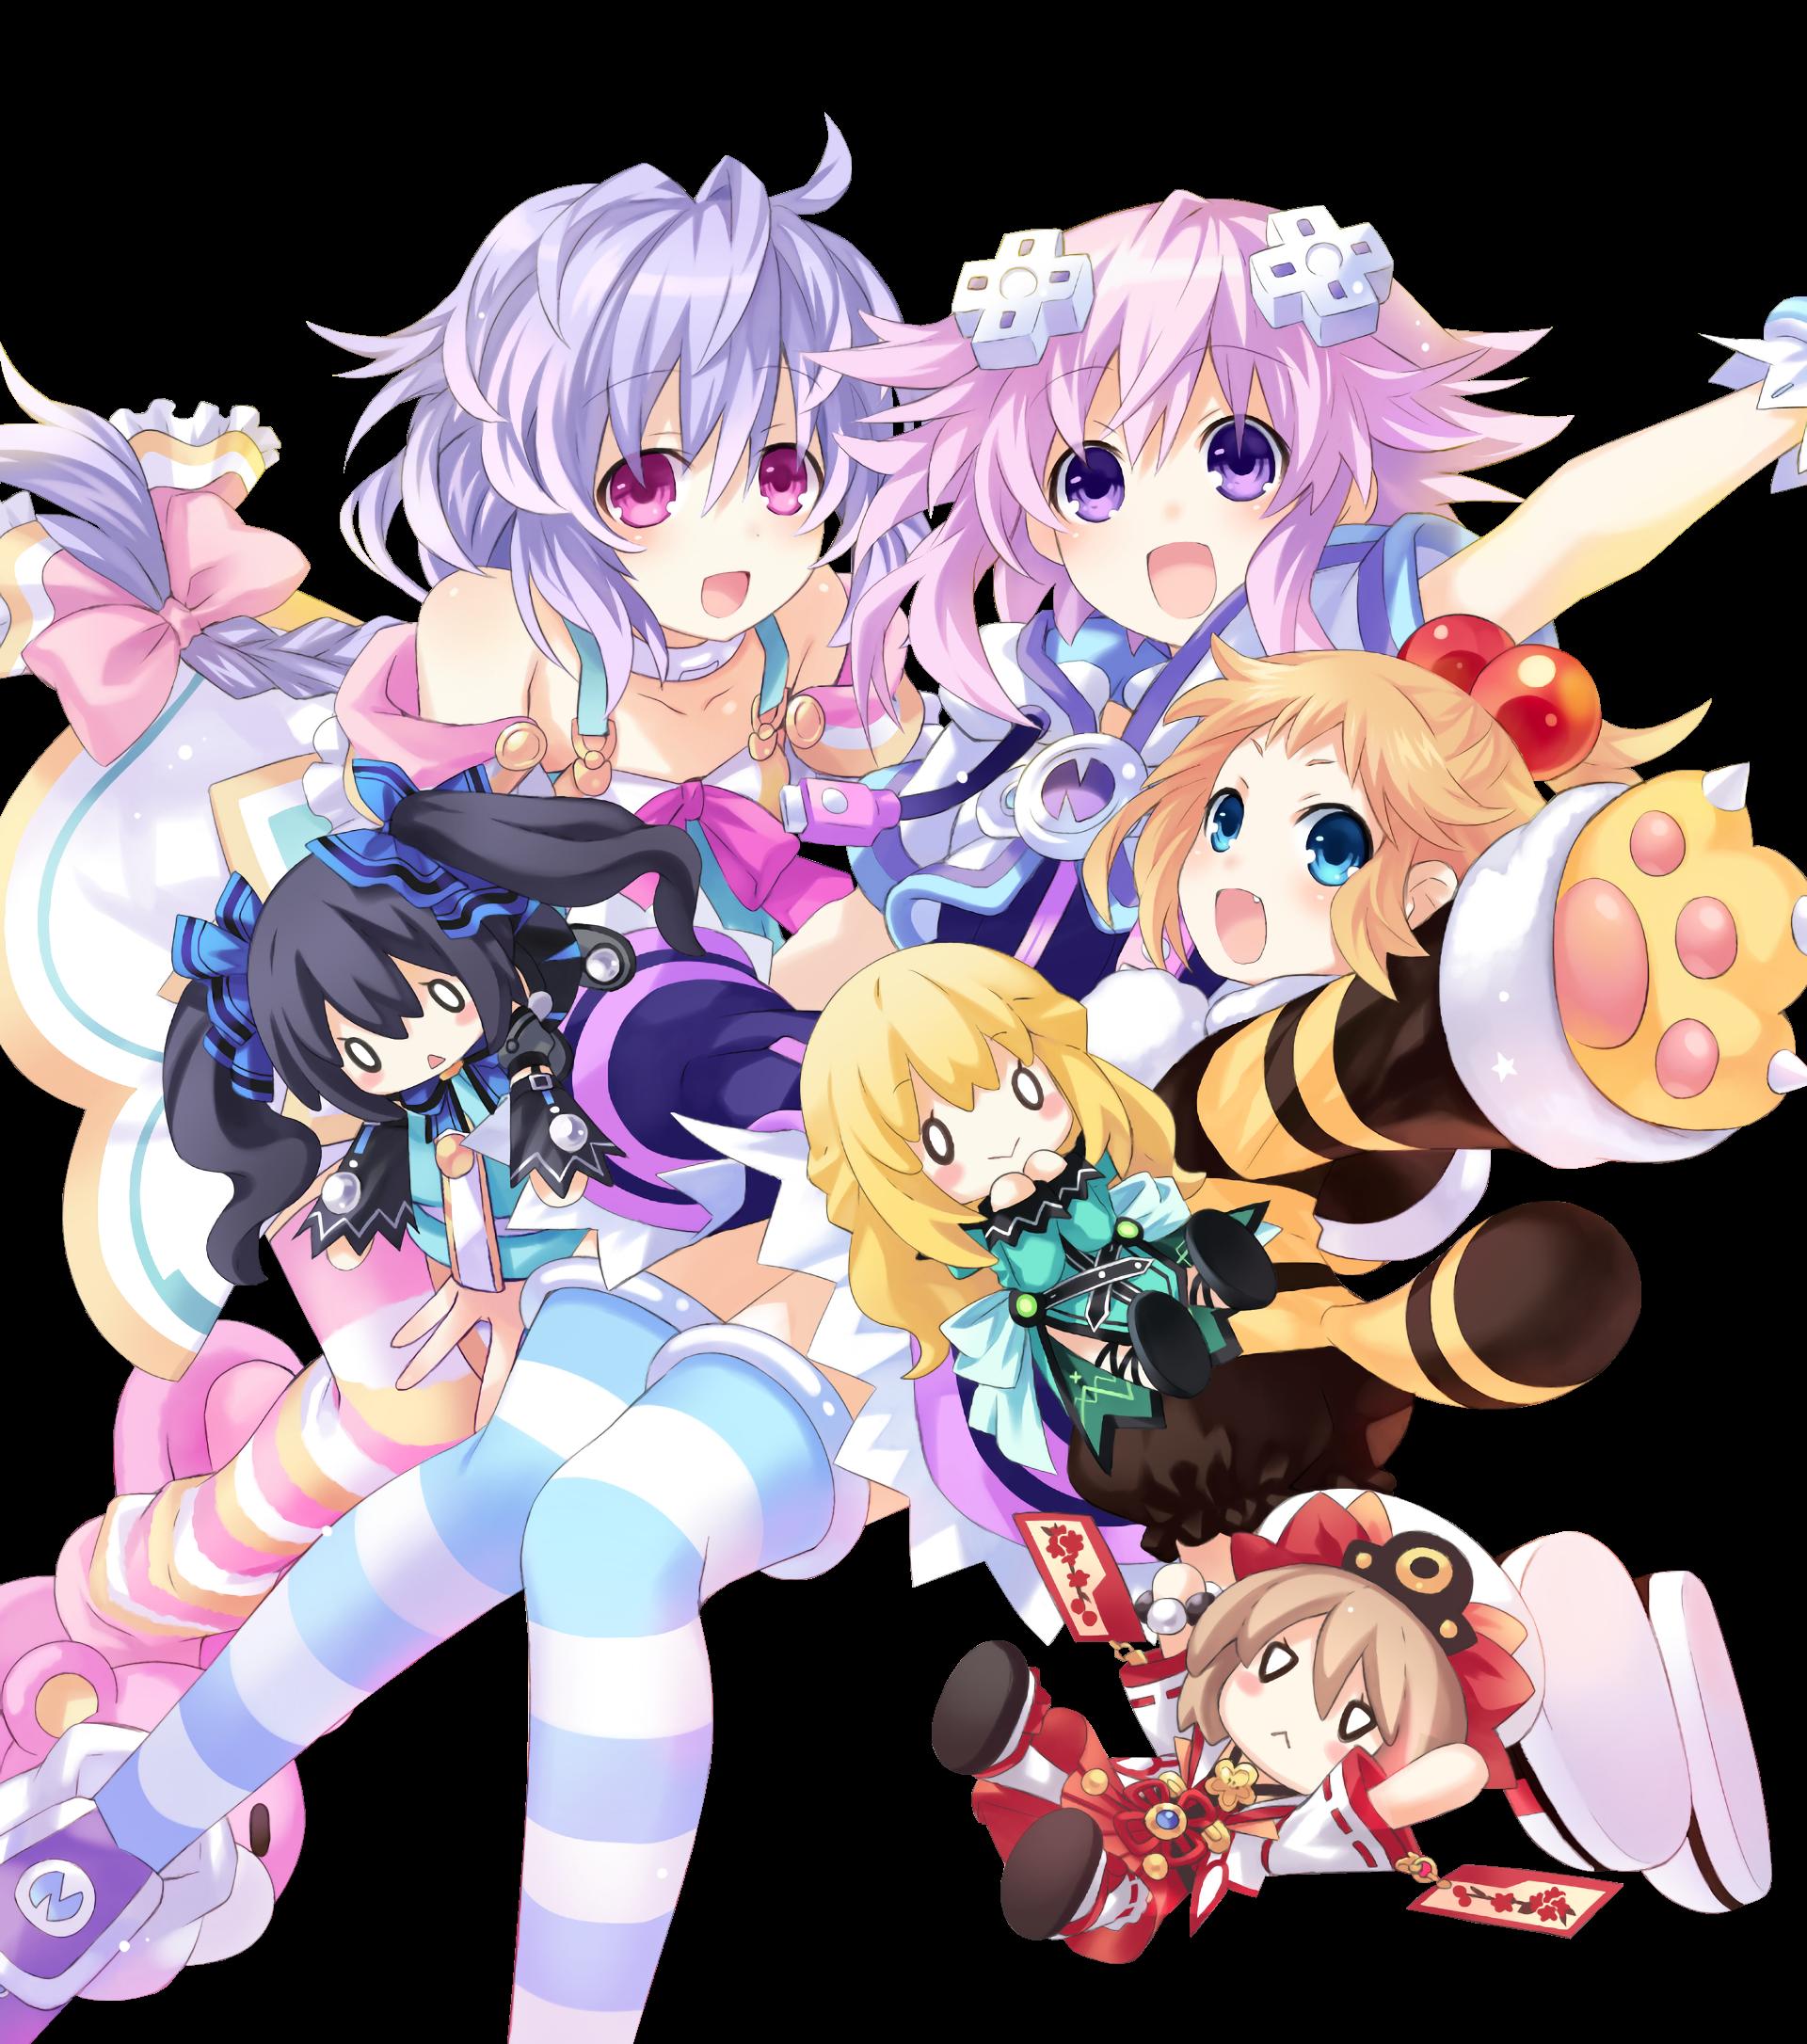 Neptune, Plutia, and Peashy Render by Jessymoonn Anime